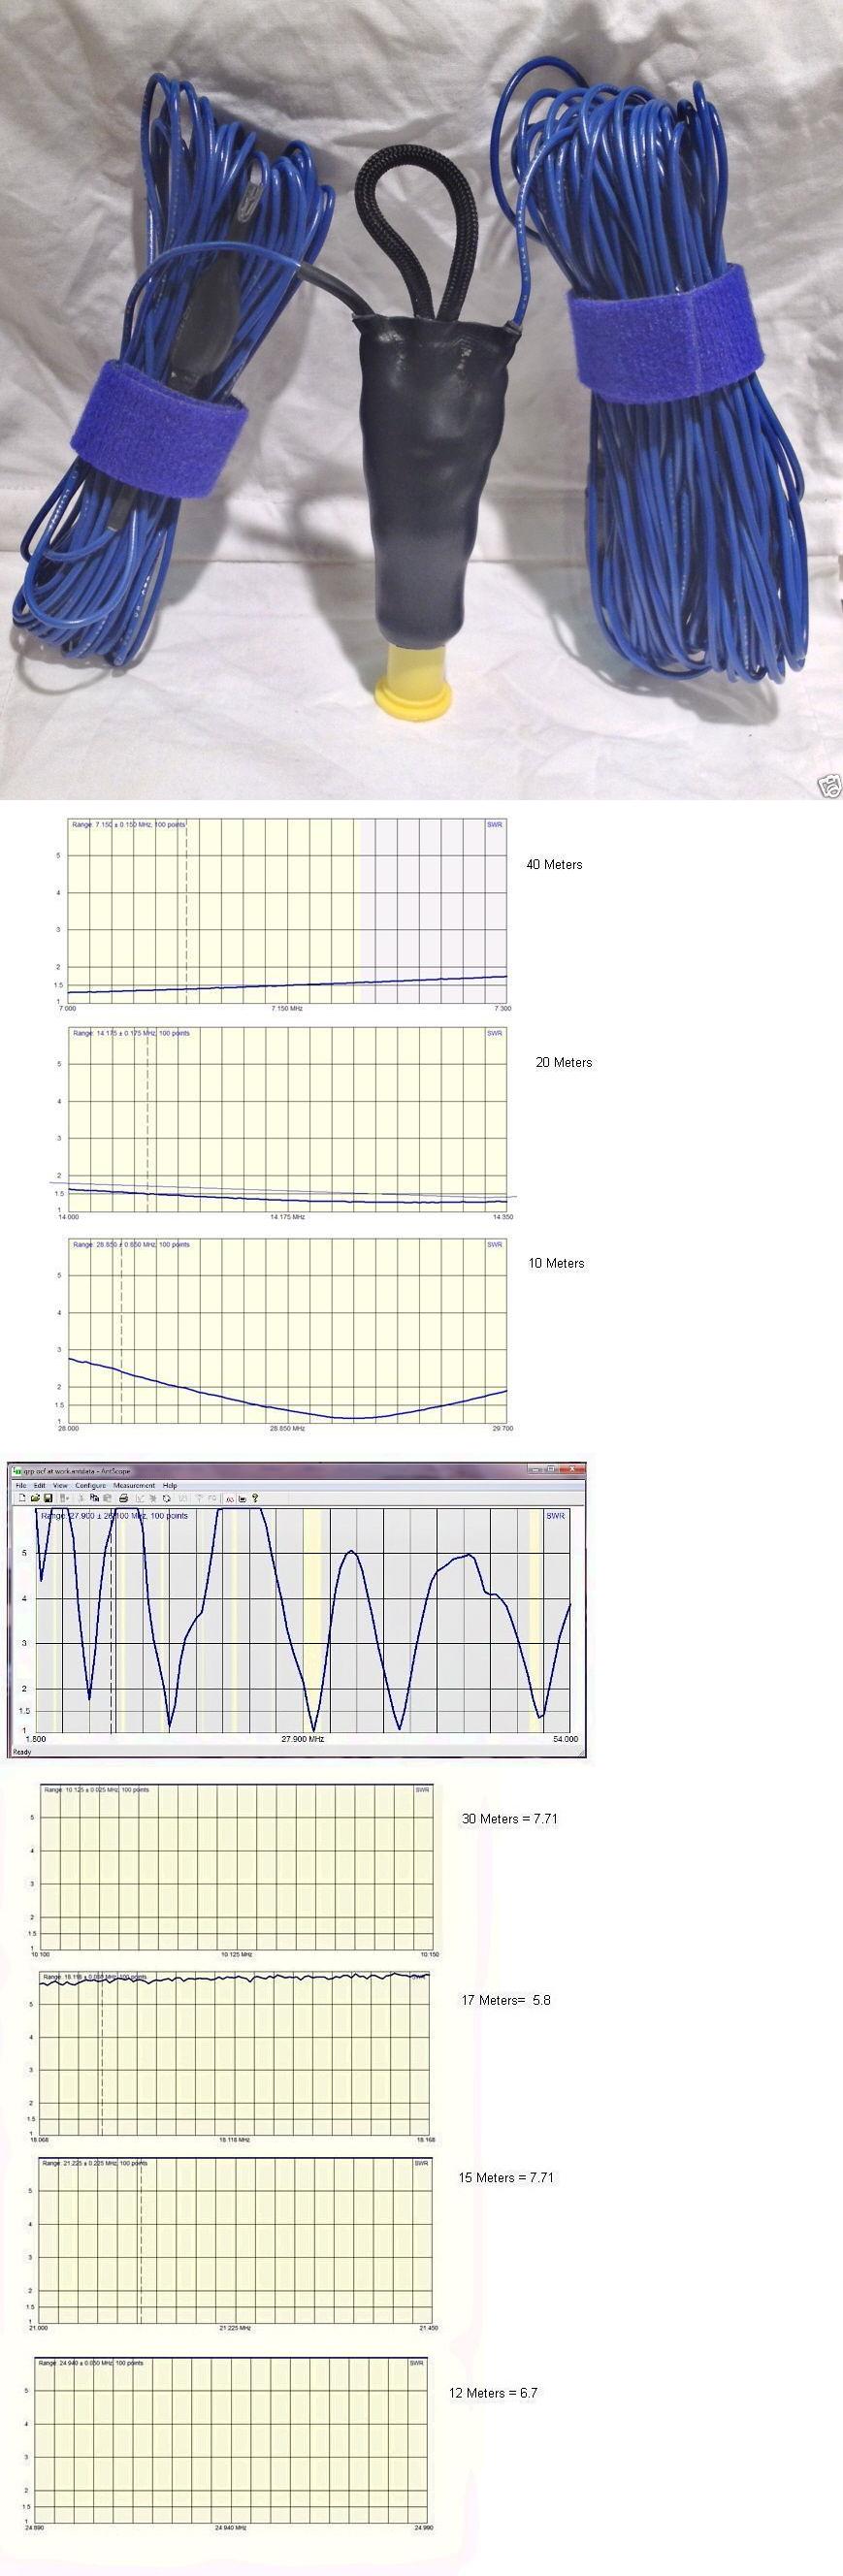 Ham Amateur Radio Antennas: Ultralight 40-6 Meter Hf Off